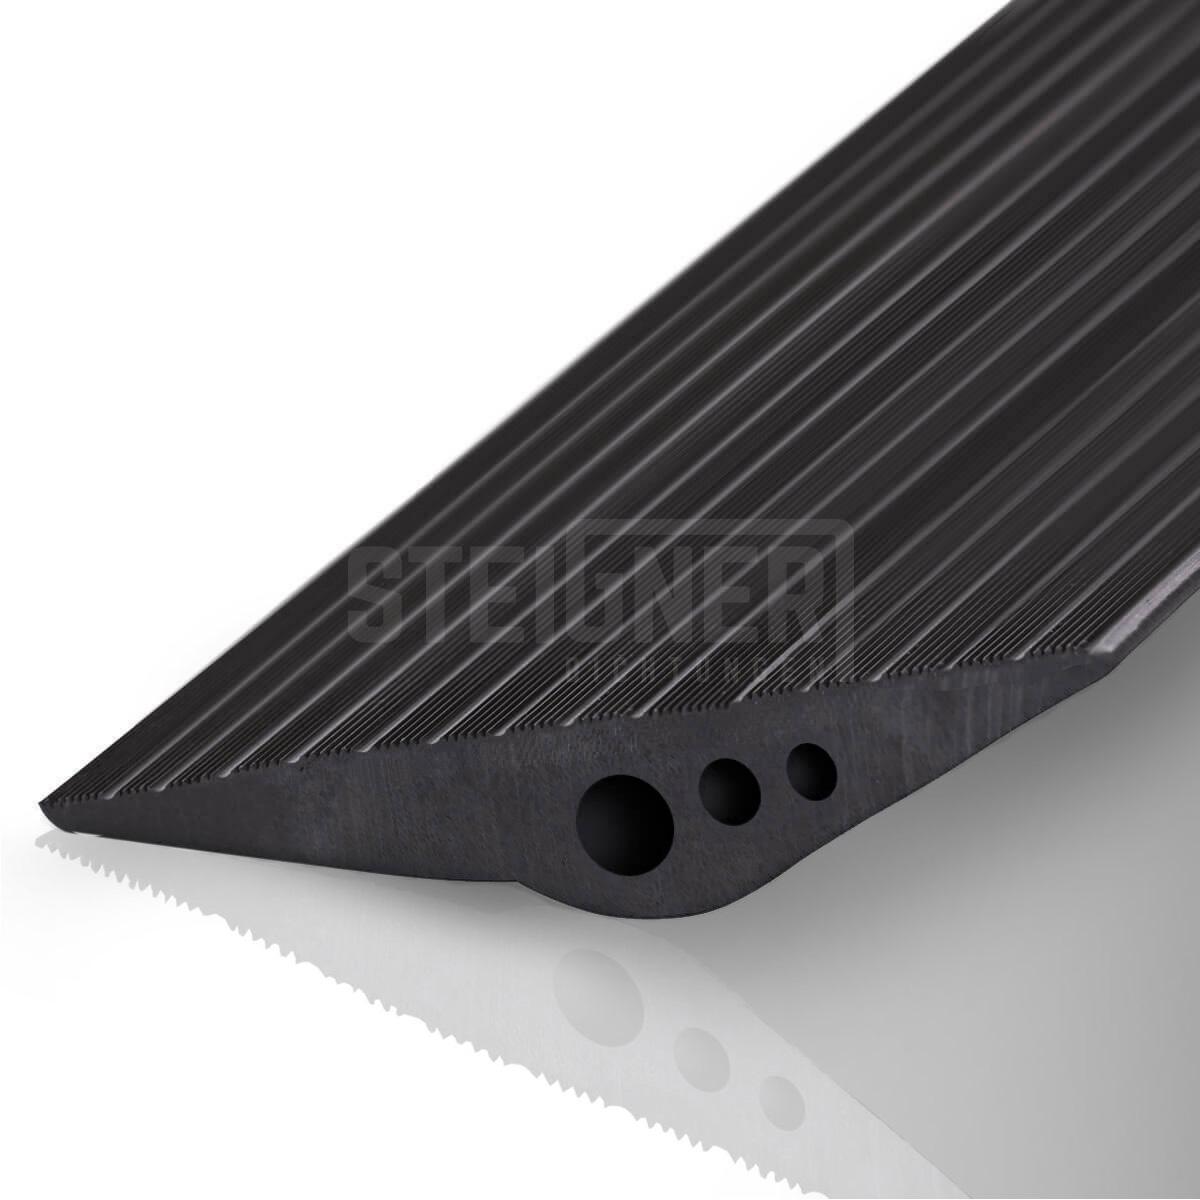 bodenabdichtung garagentor dichtung bodenplatte gummilippe. Black Bedroom Furniture Sets. Home Design Ideas